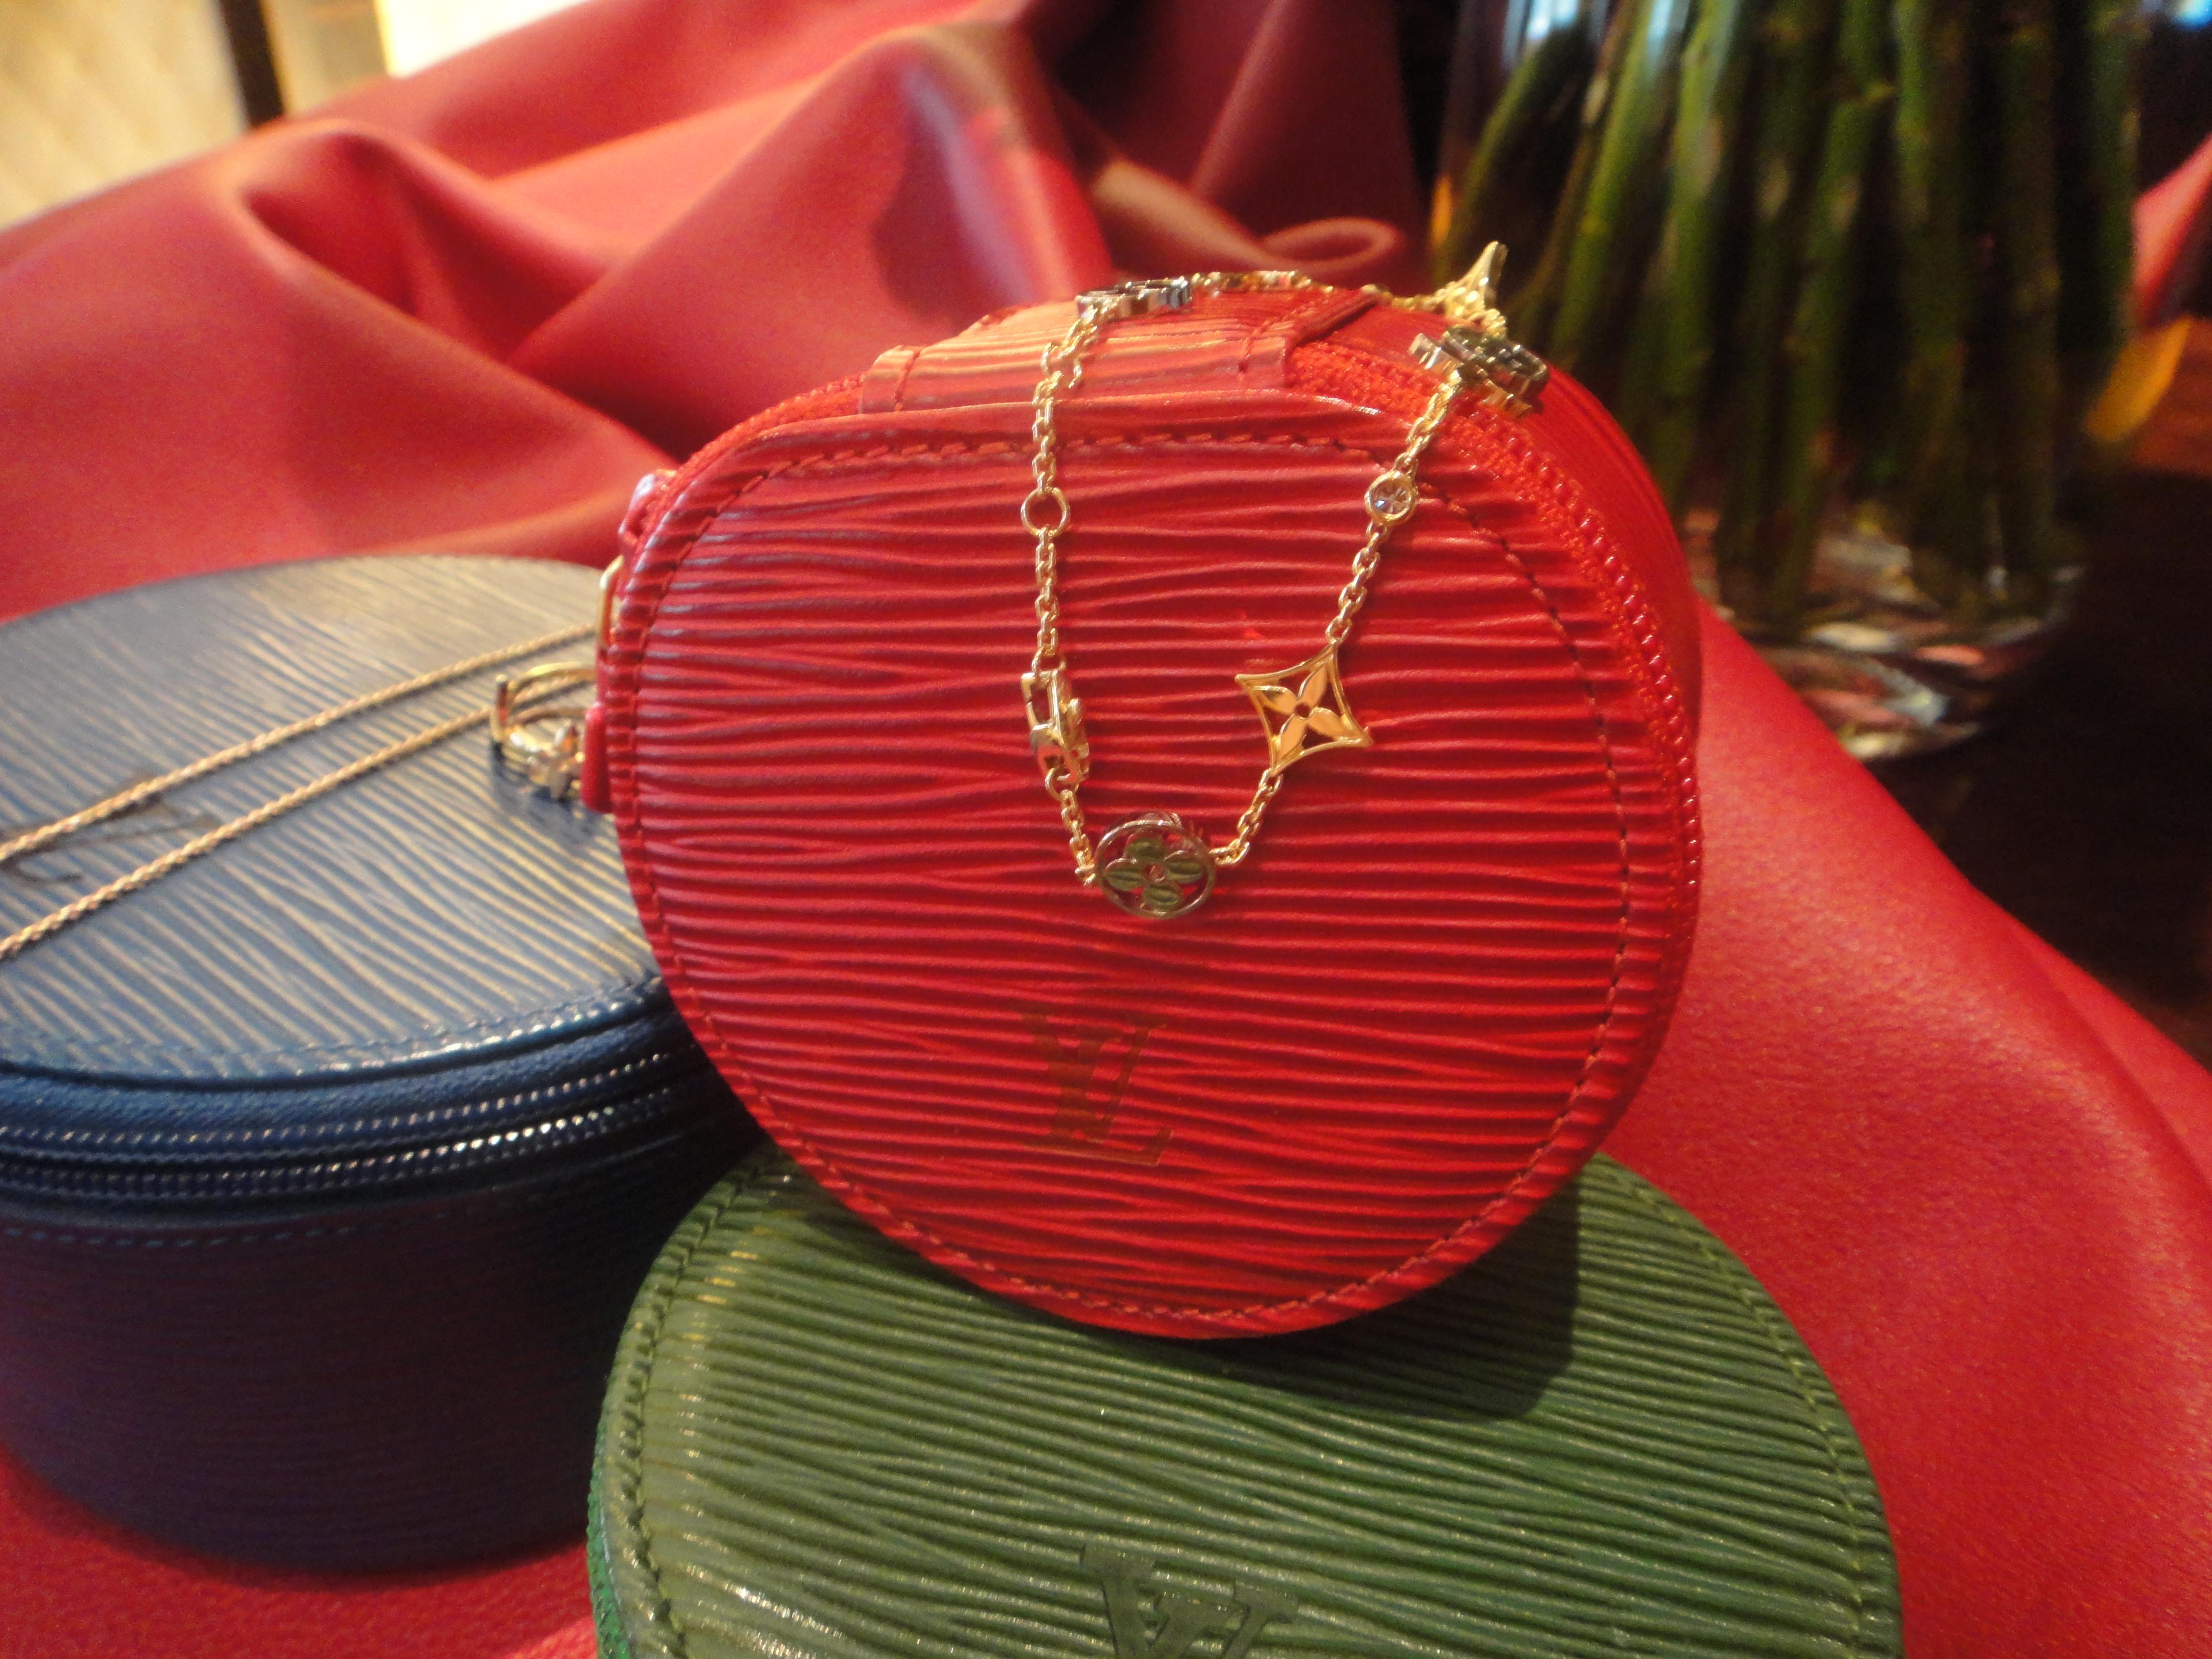 Epi Jewelry case & Monogram Idylle bracelet